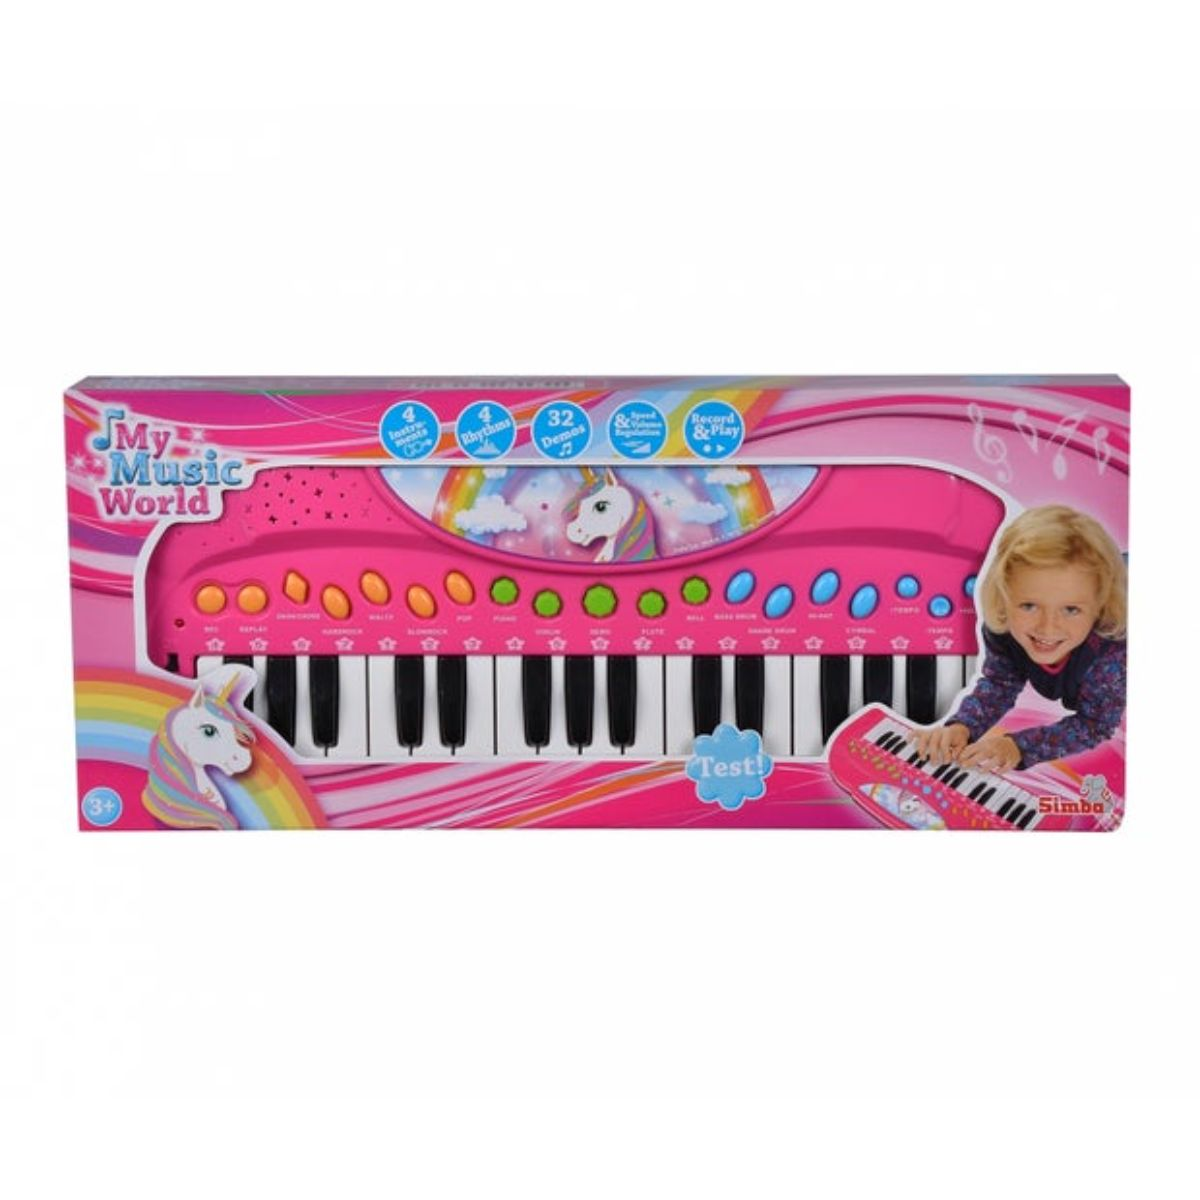 Orga muzicala, My Music World, cu 32 de clape si model cu unicorn